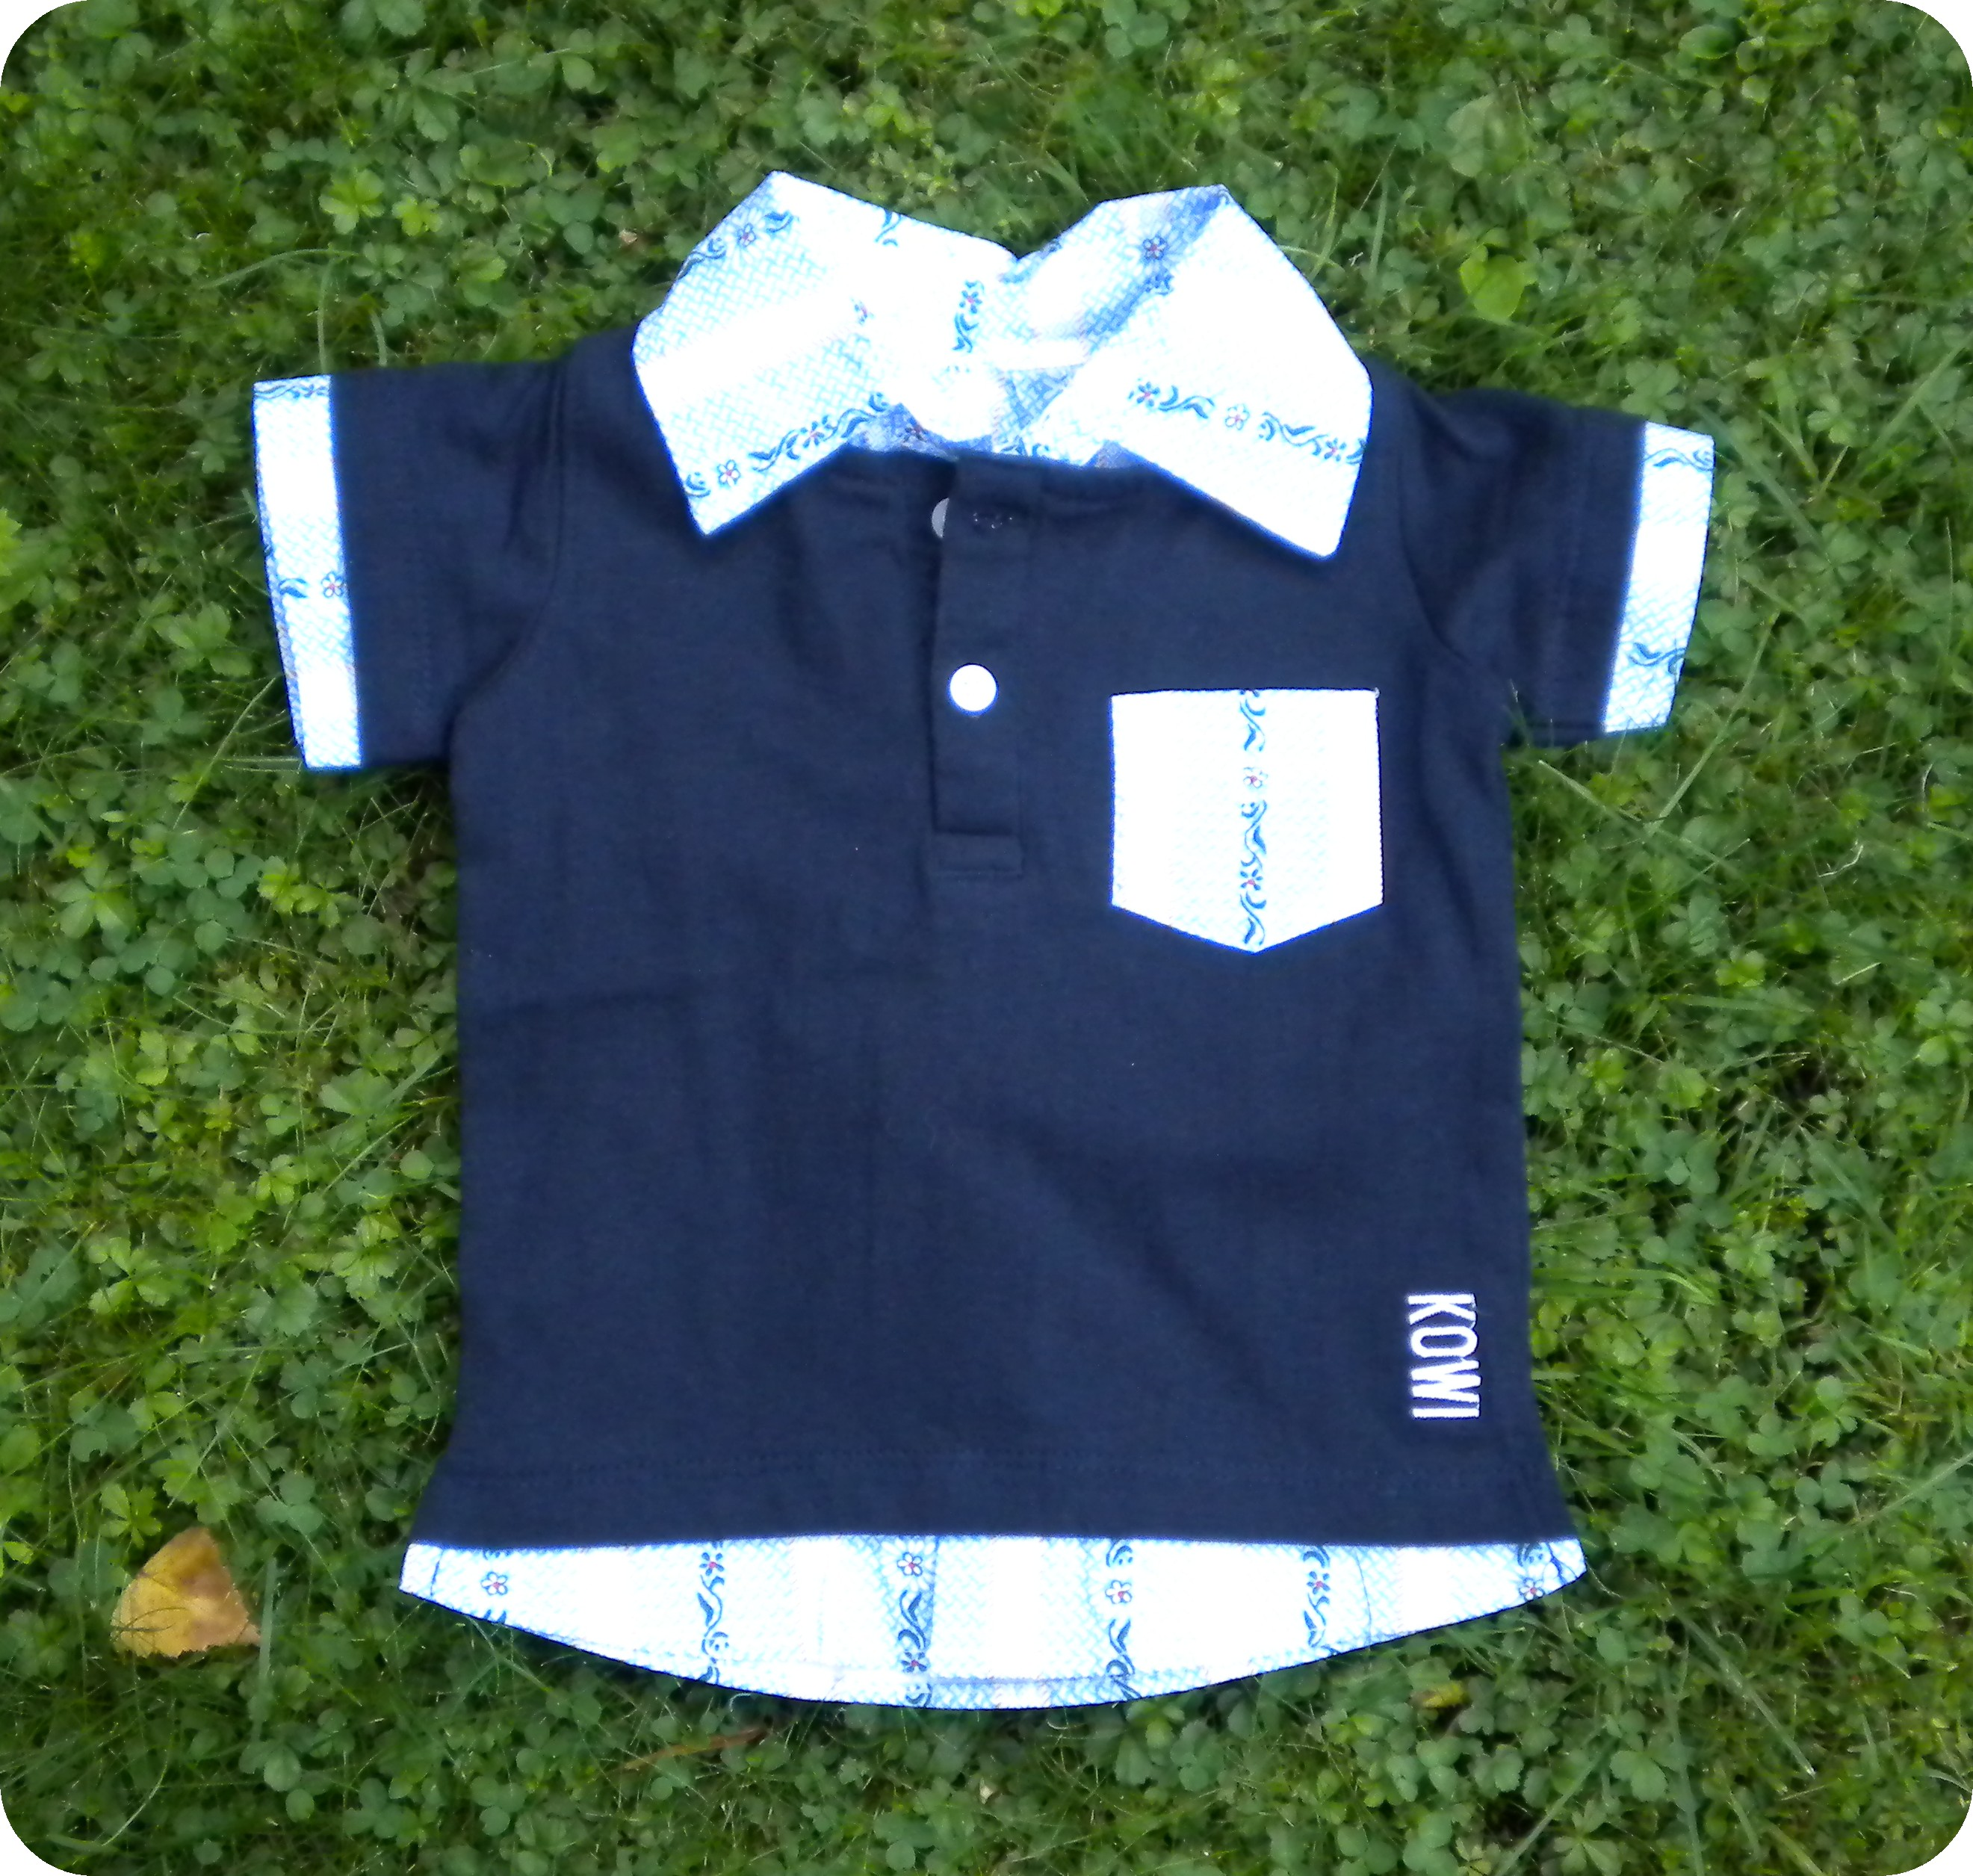 Polo Shirt blau mit Edelweiss Kragen, Kurzarm